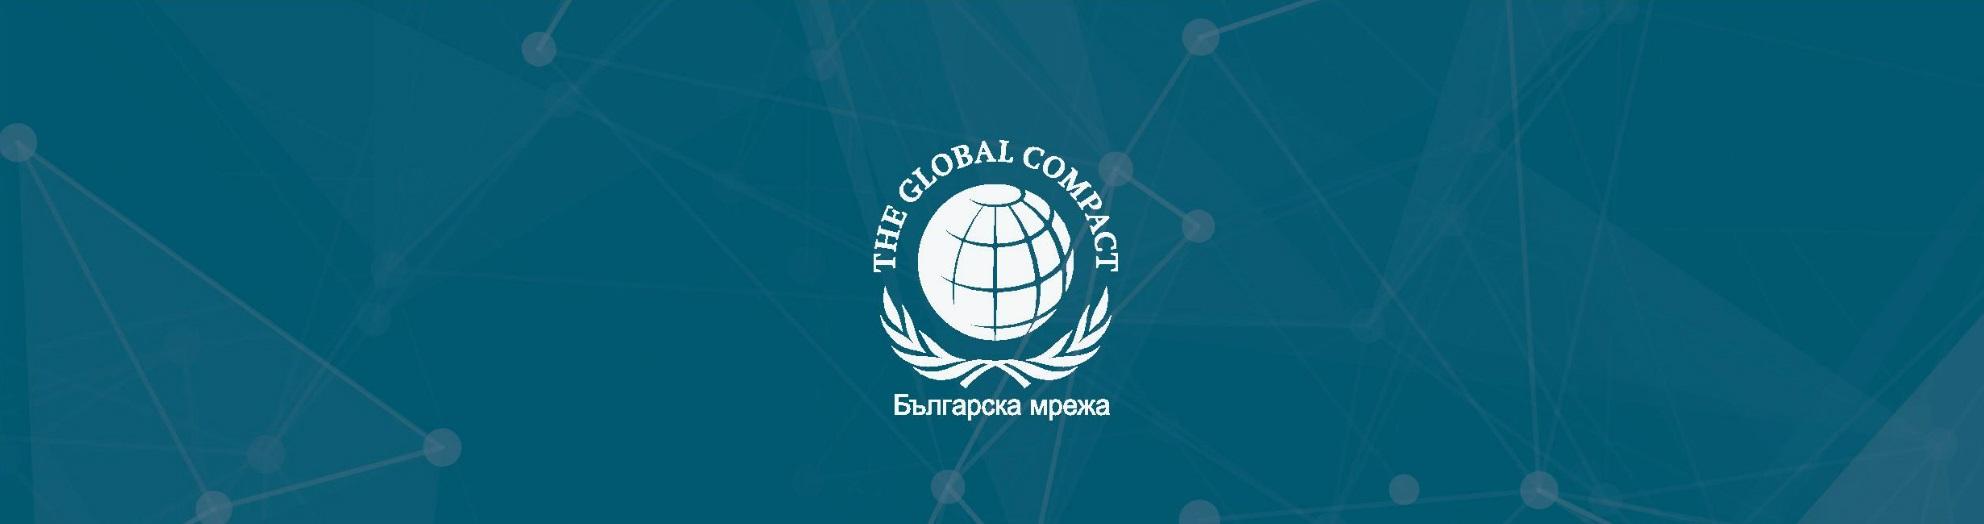 BMGD_Goals2016- Strategic plan BG-2 1